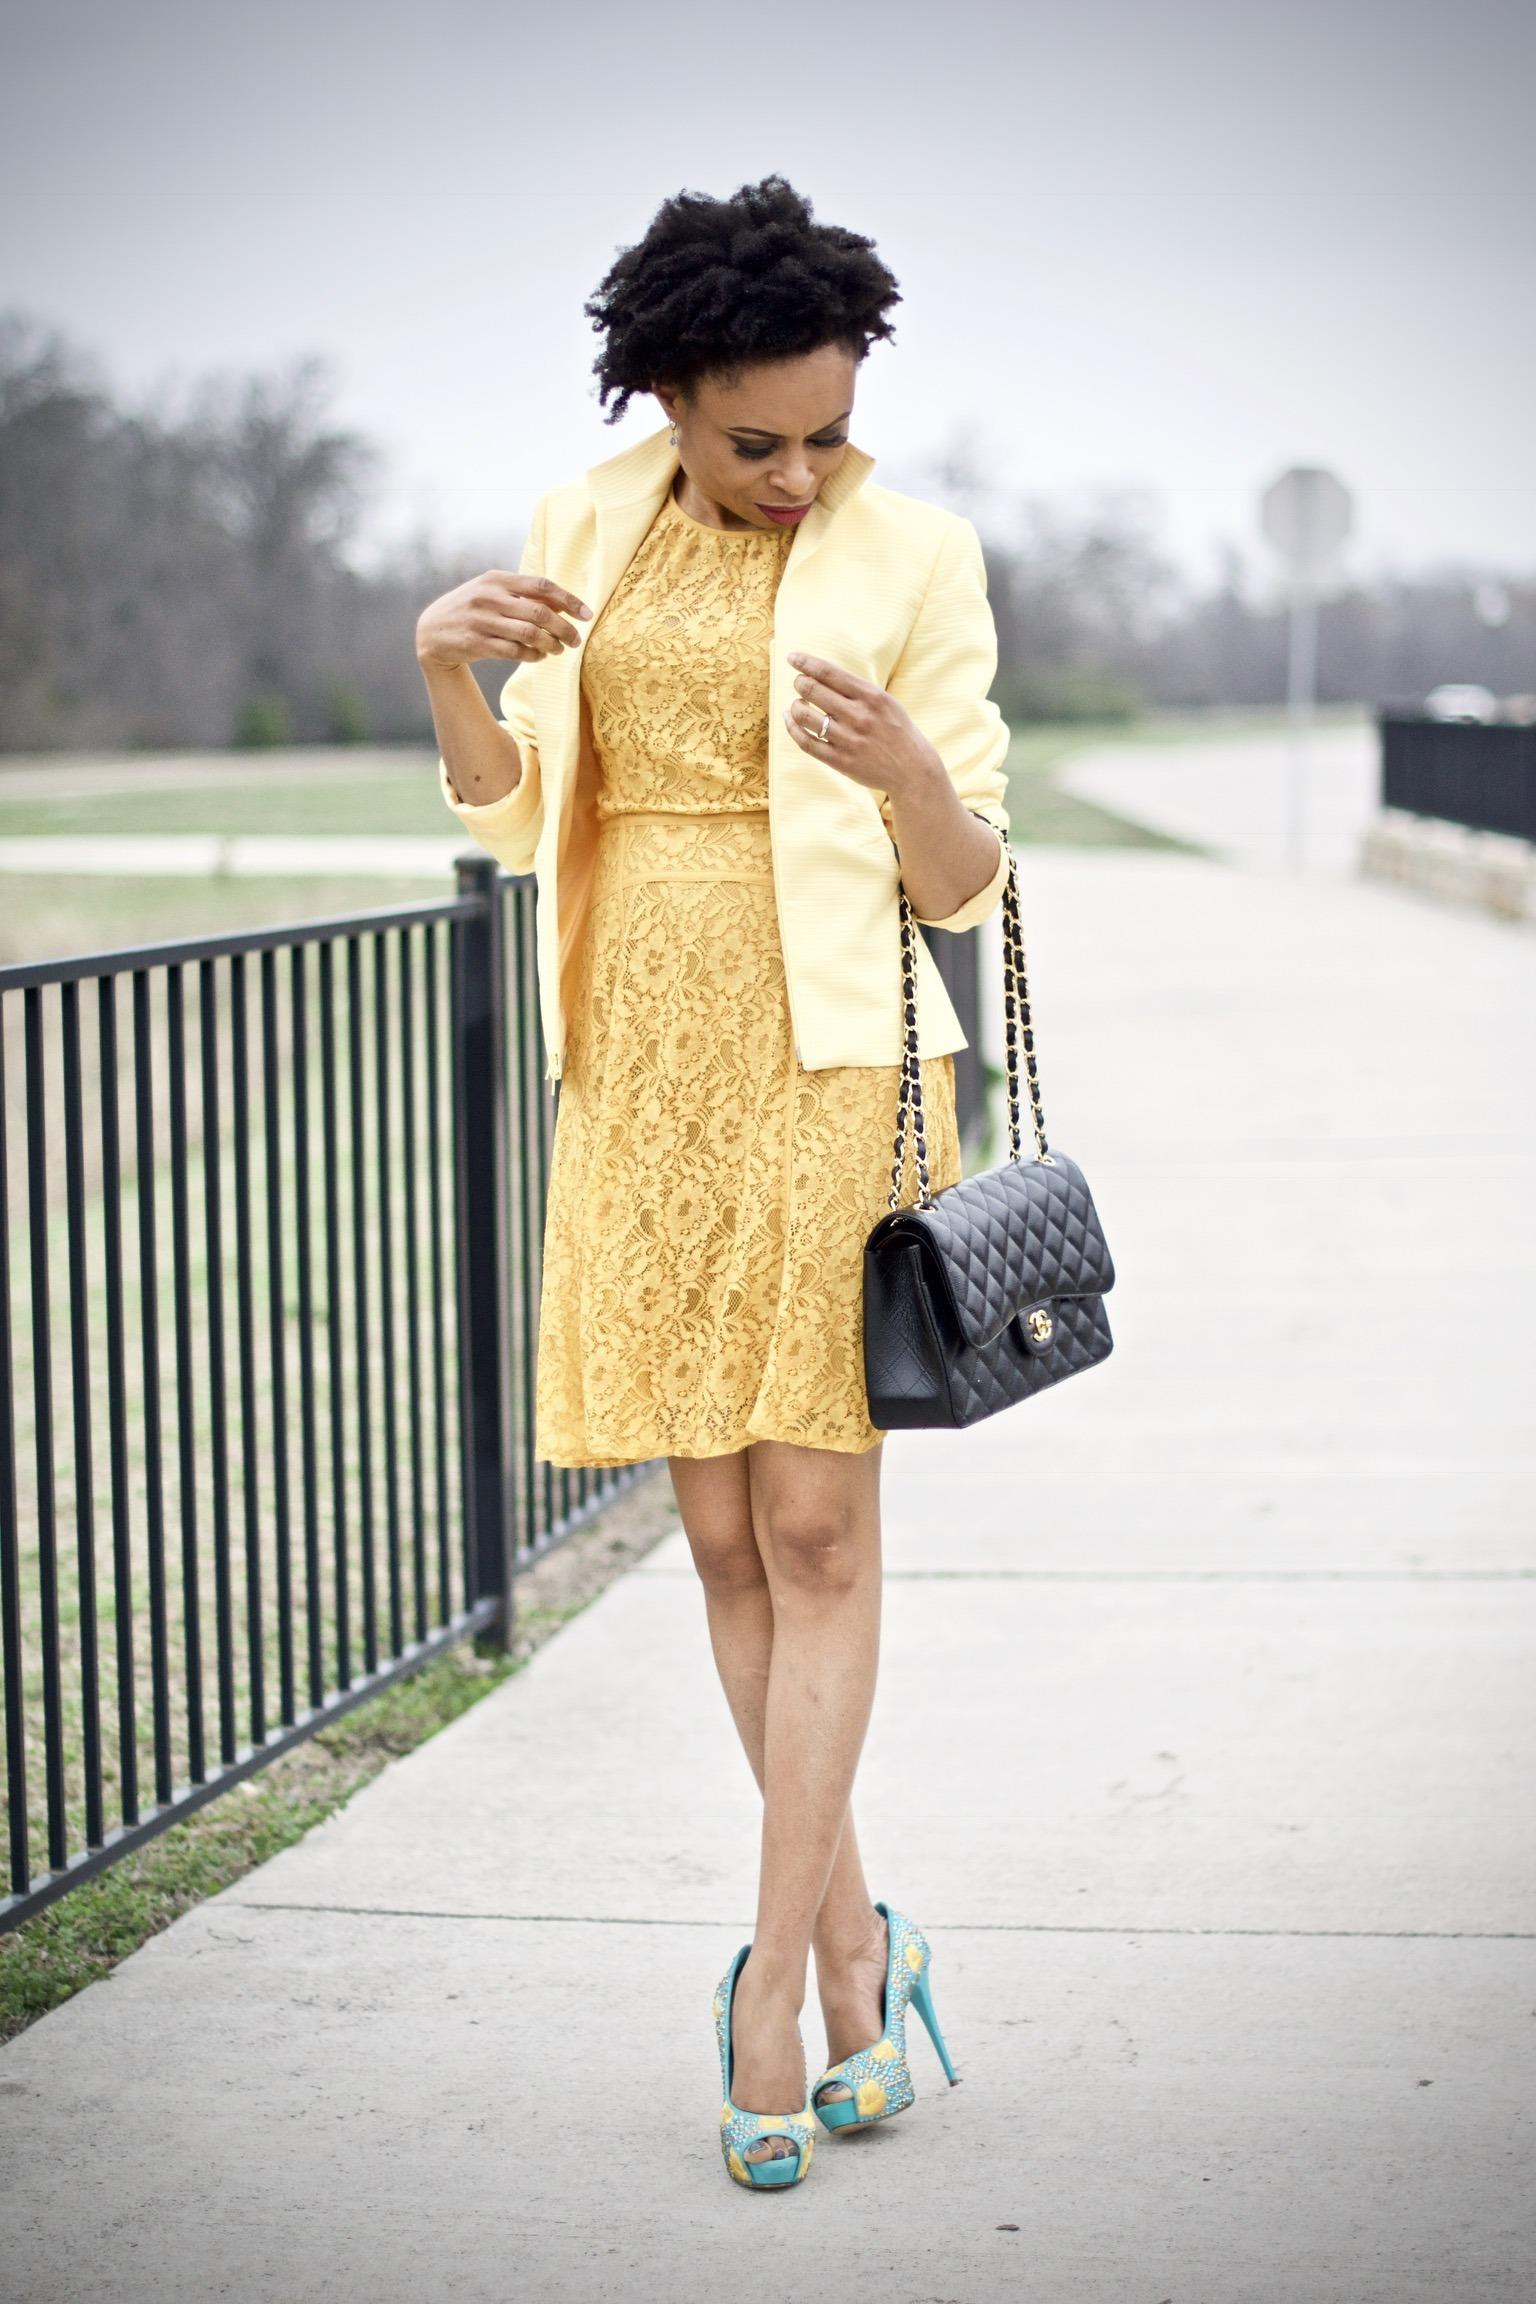 6 tips for styling a Denim Jacket, stylishly